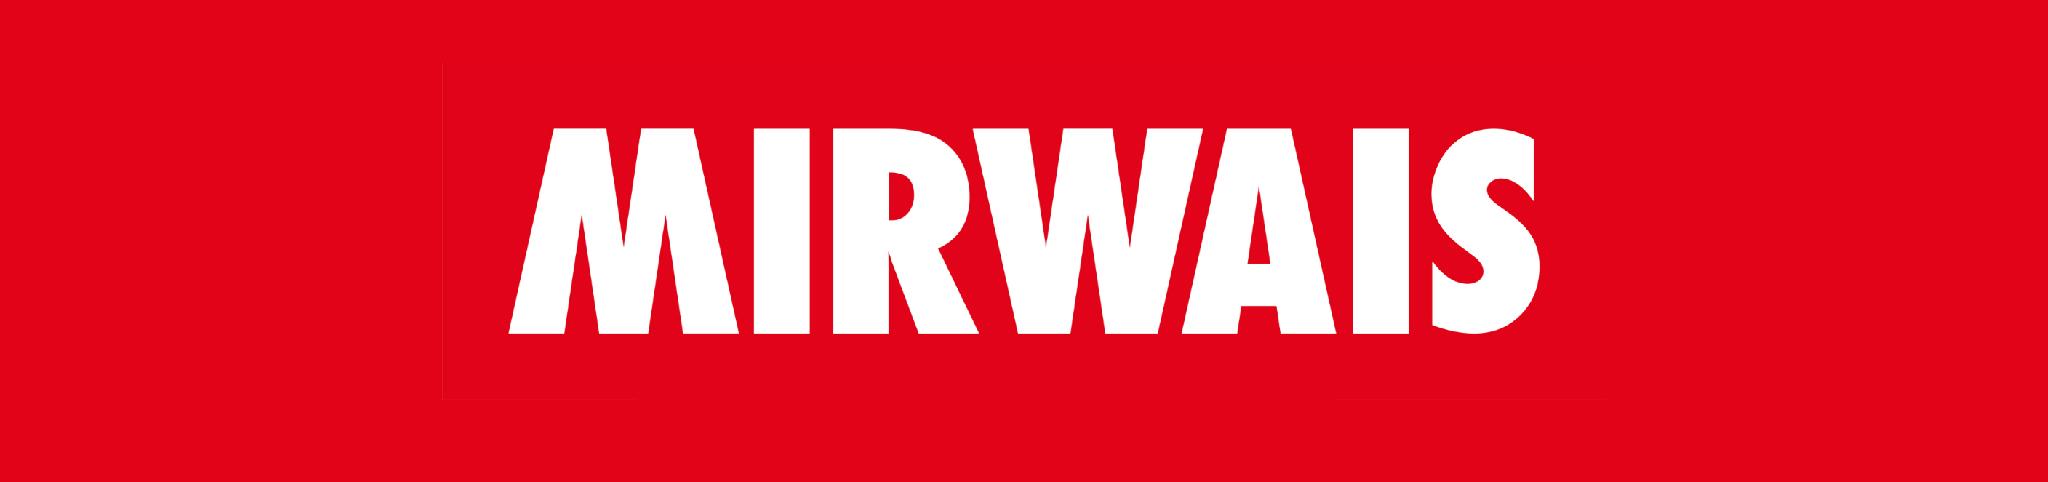 Mirwais_banner